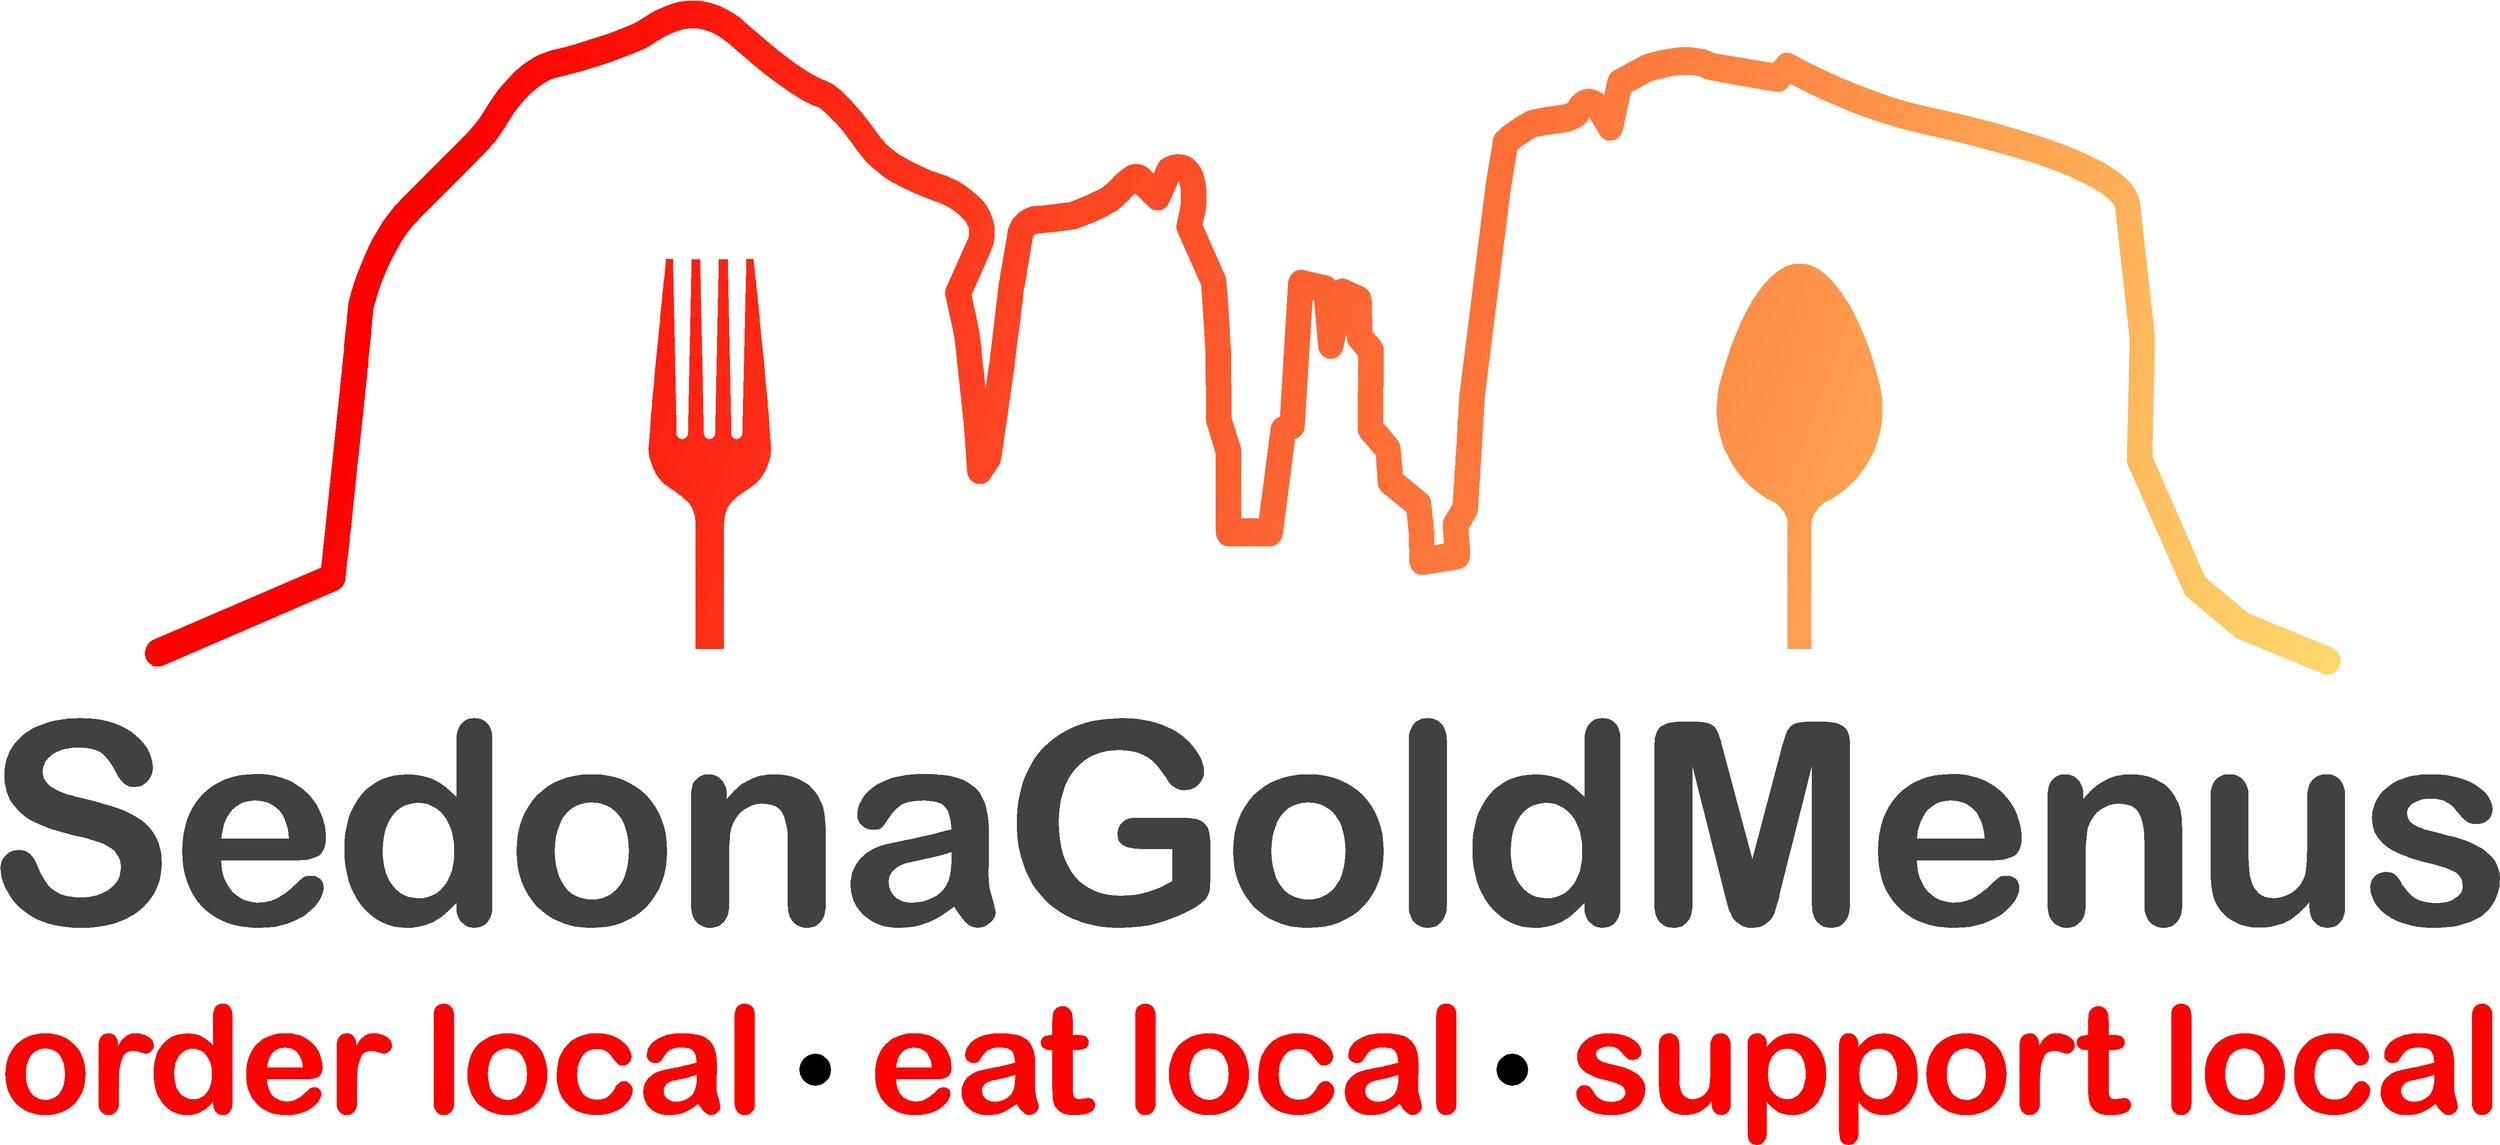 sedona gold menus hires.jpg